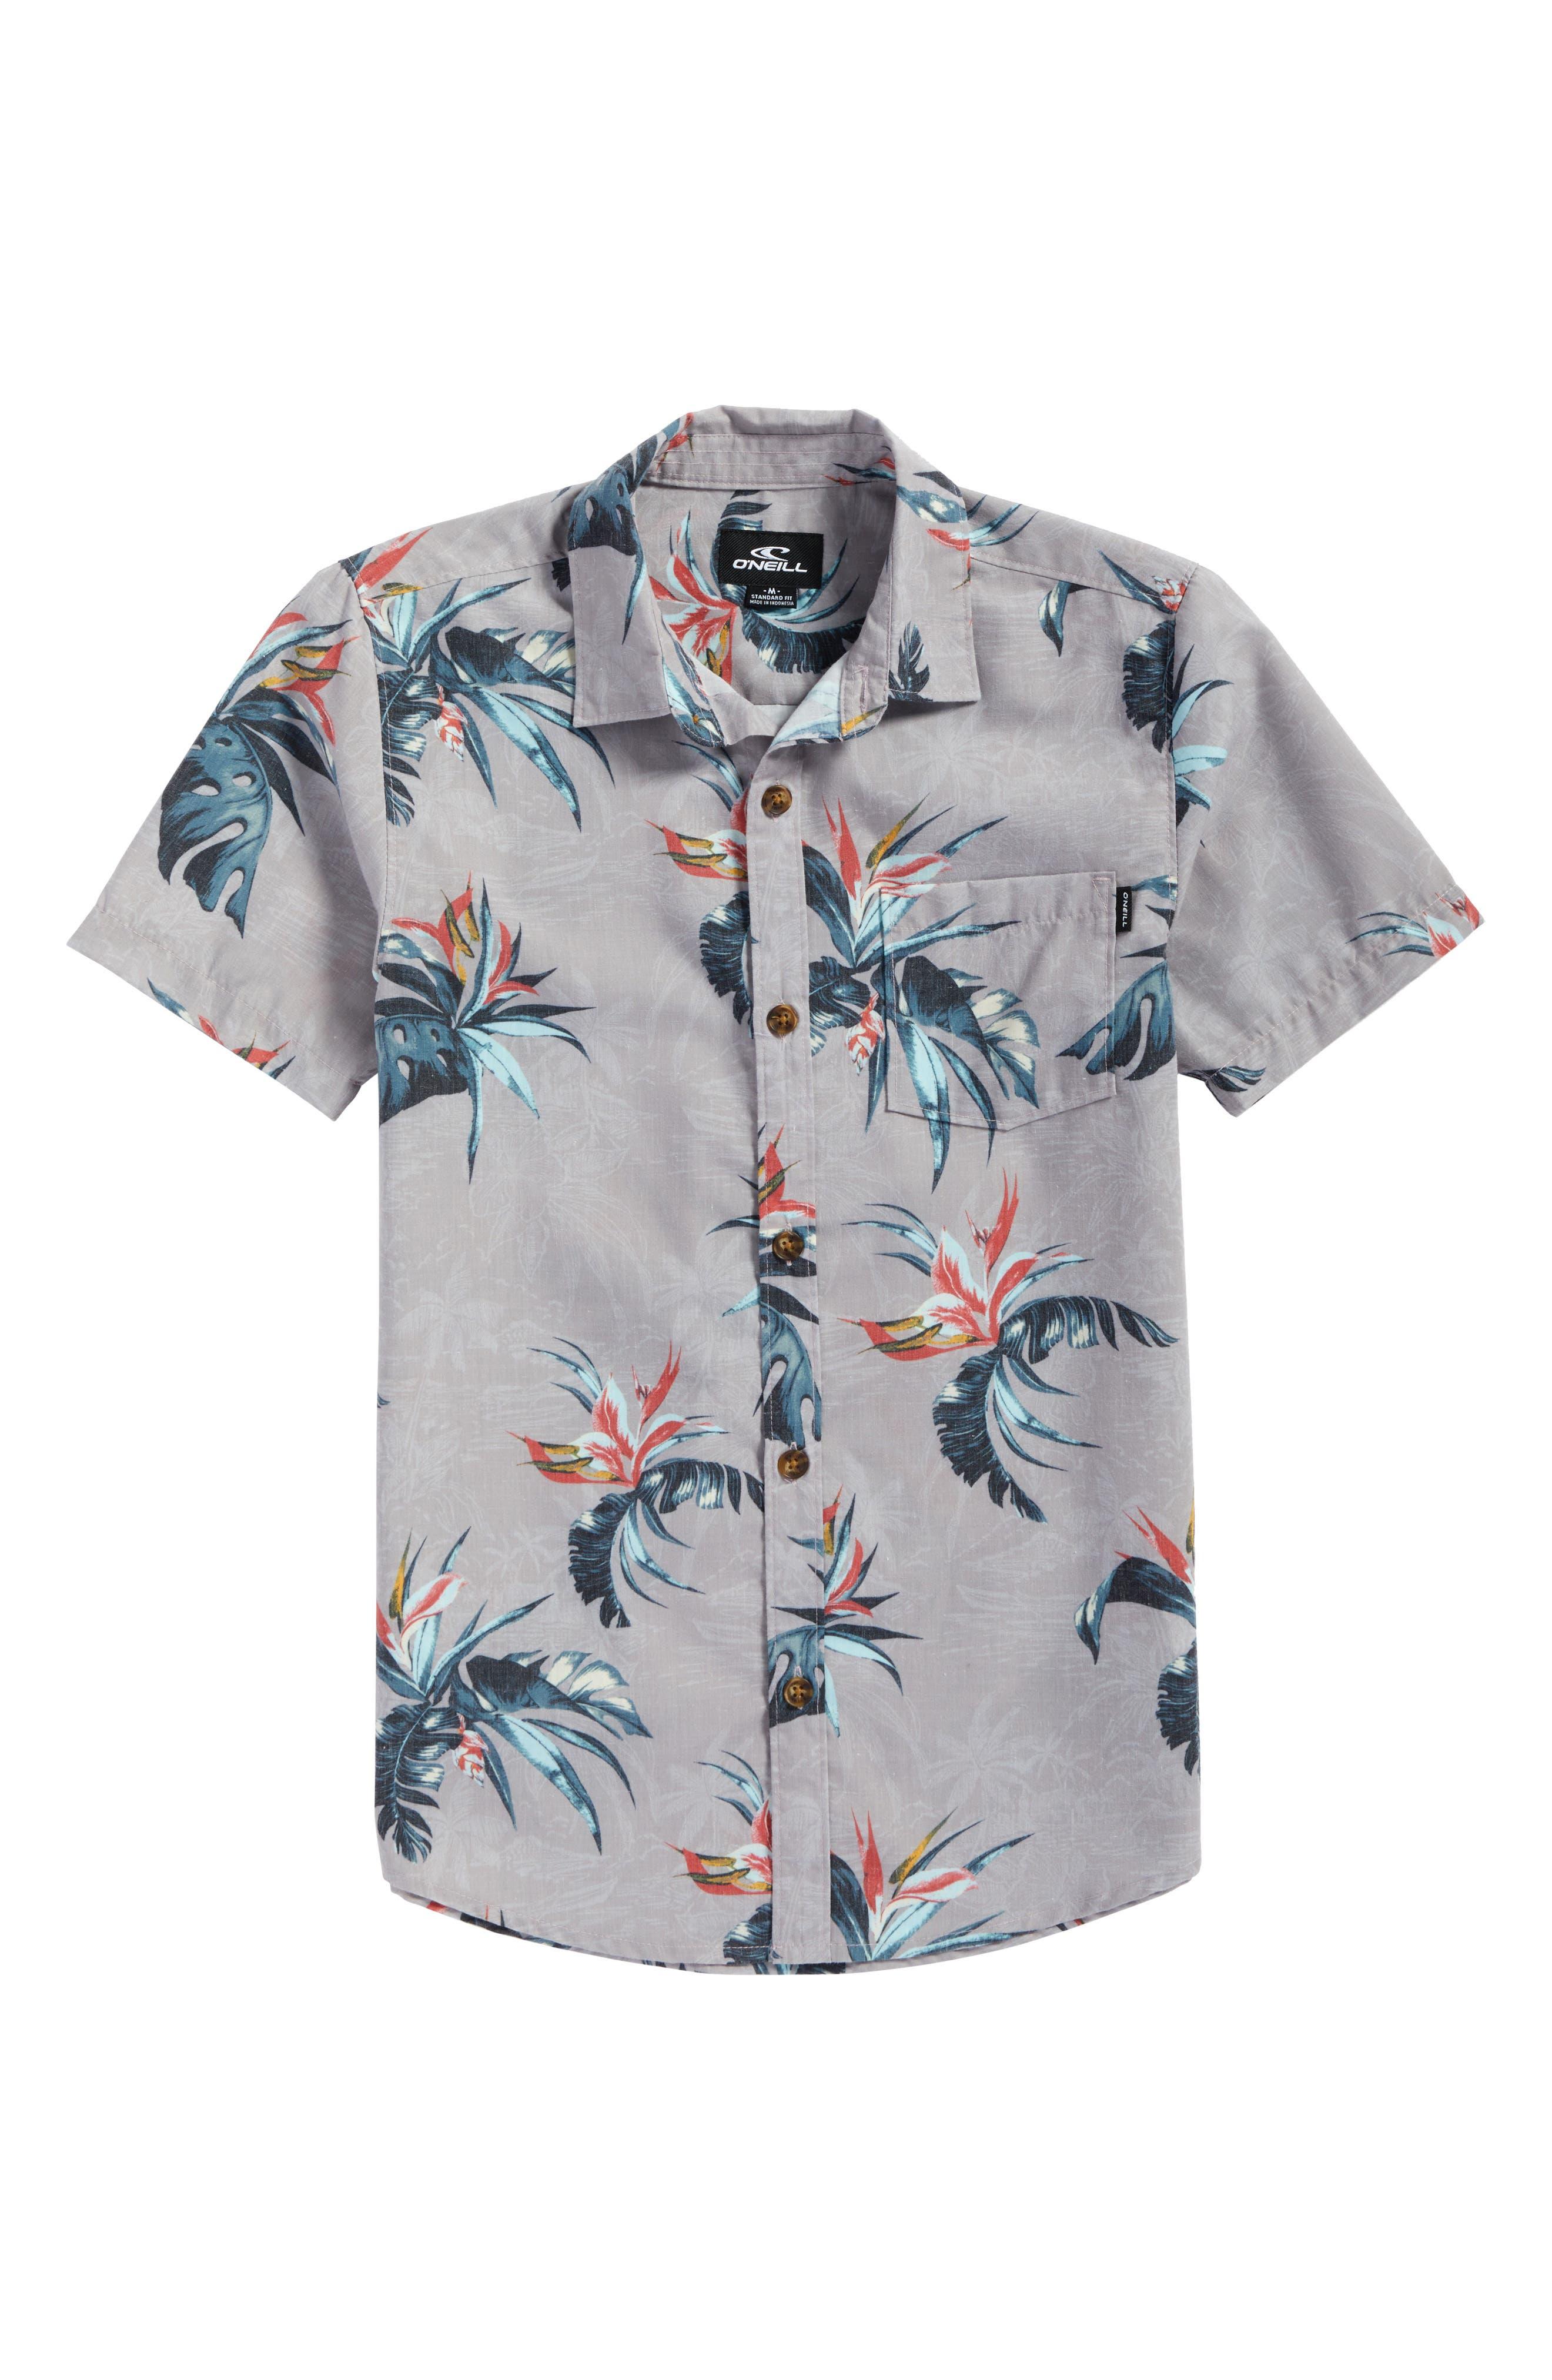 Main Image - O'Neill Islander Short Sleeve Shirt (Little Boys)